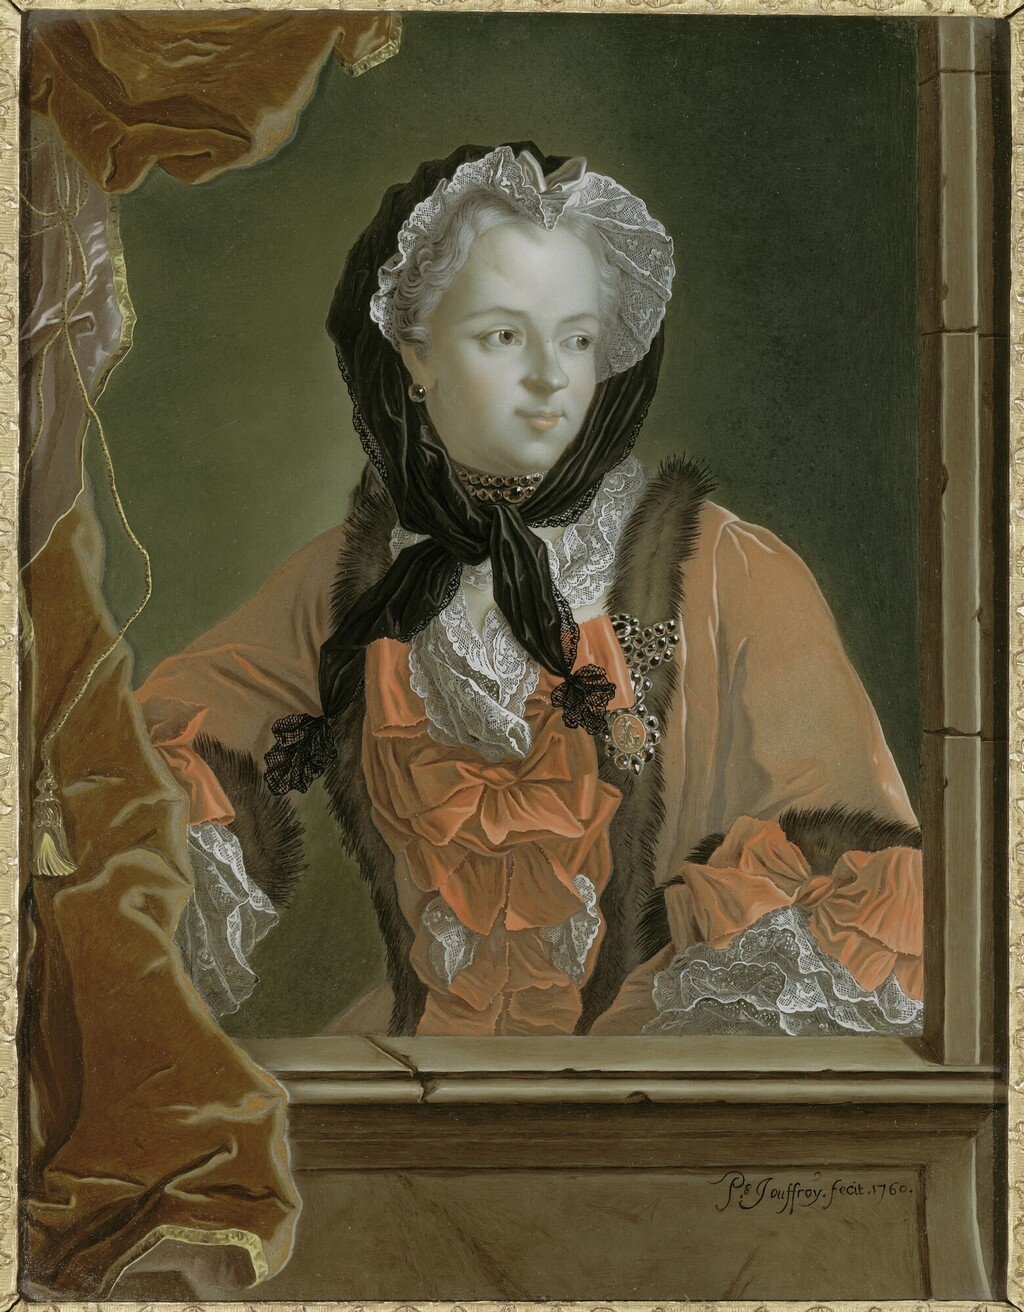 La reine Marie Leszczynska - Page 2 Imagep75